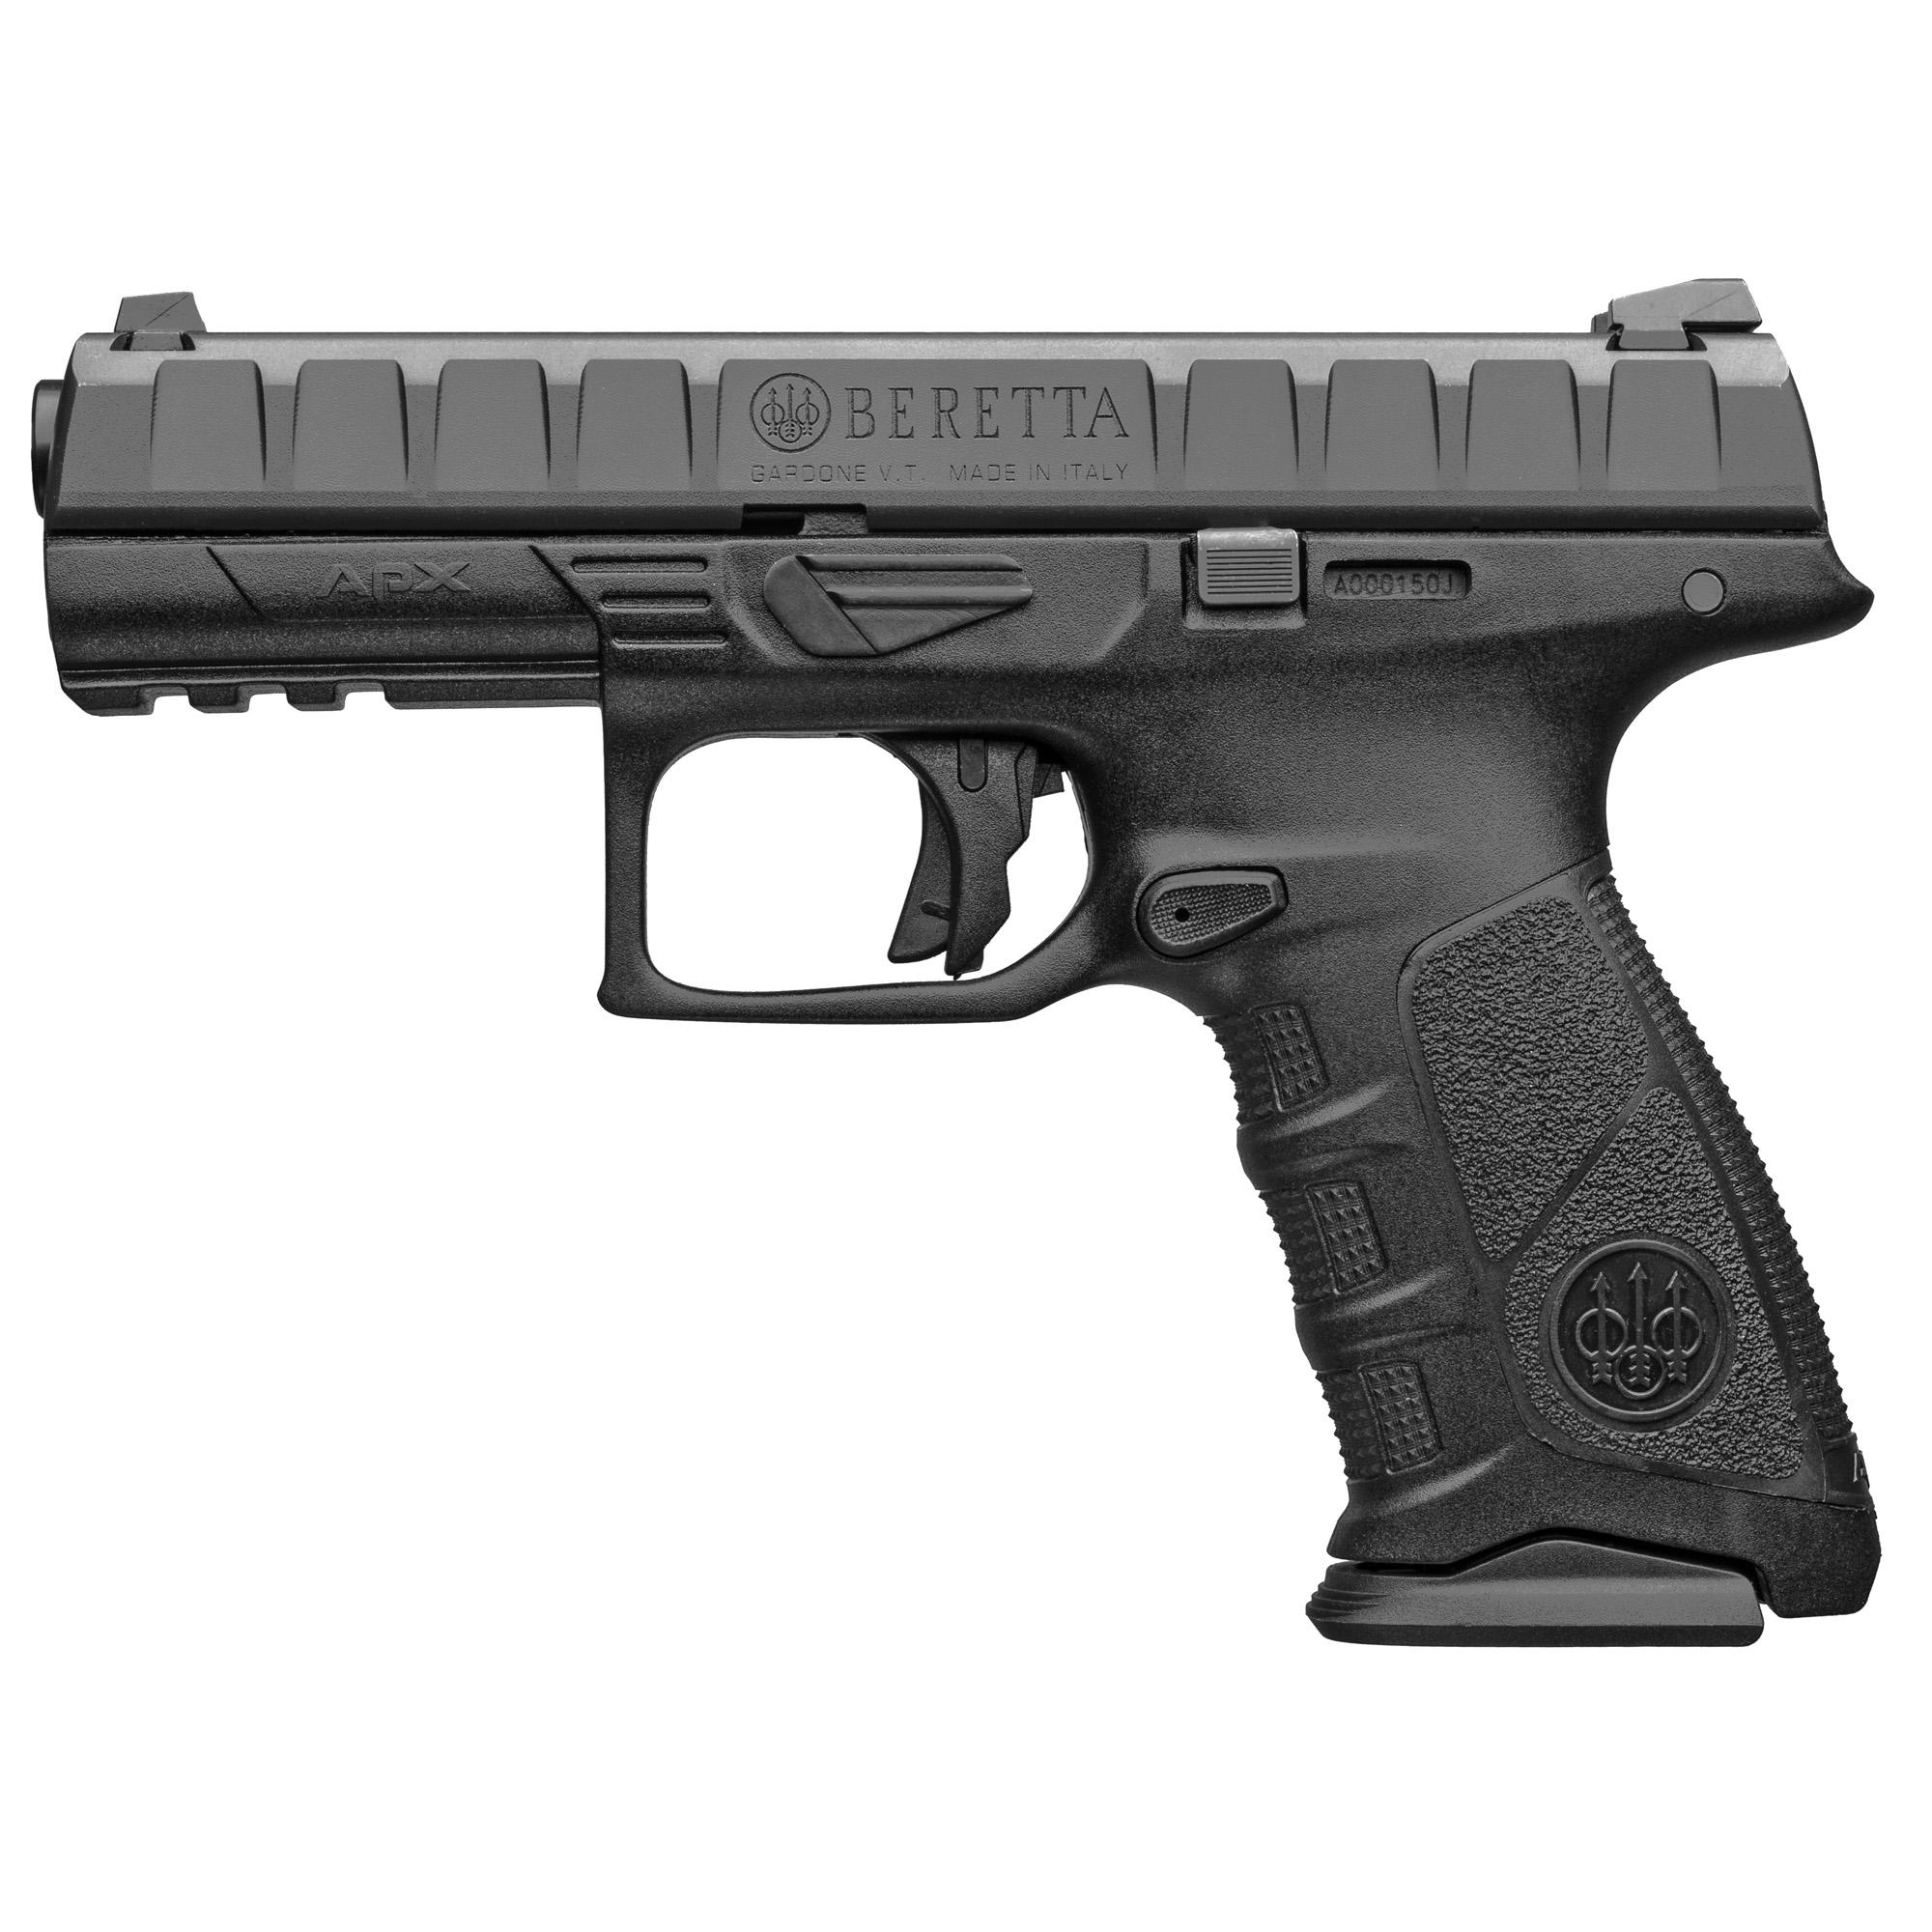 "Beretta Apx 9mm 4.25"" Blk 17rd Blem"